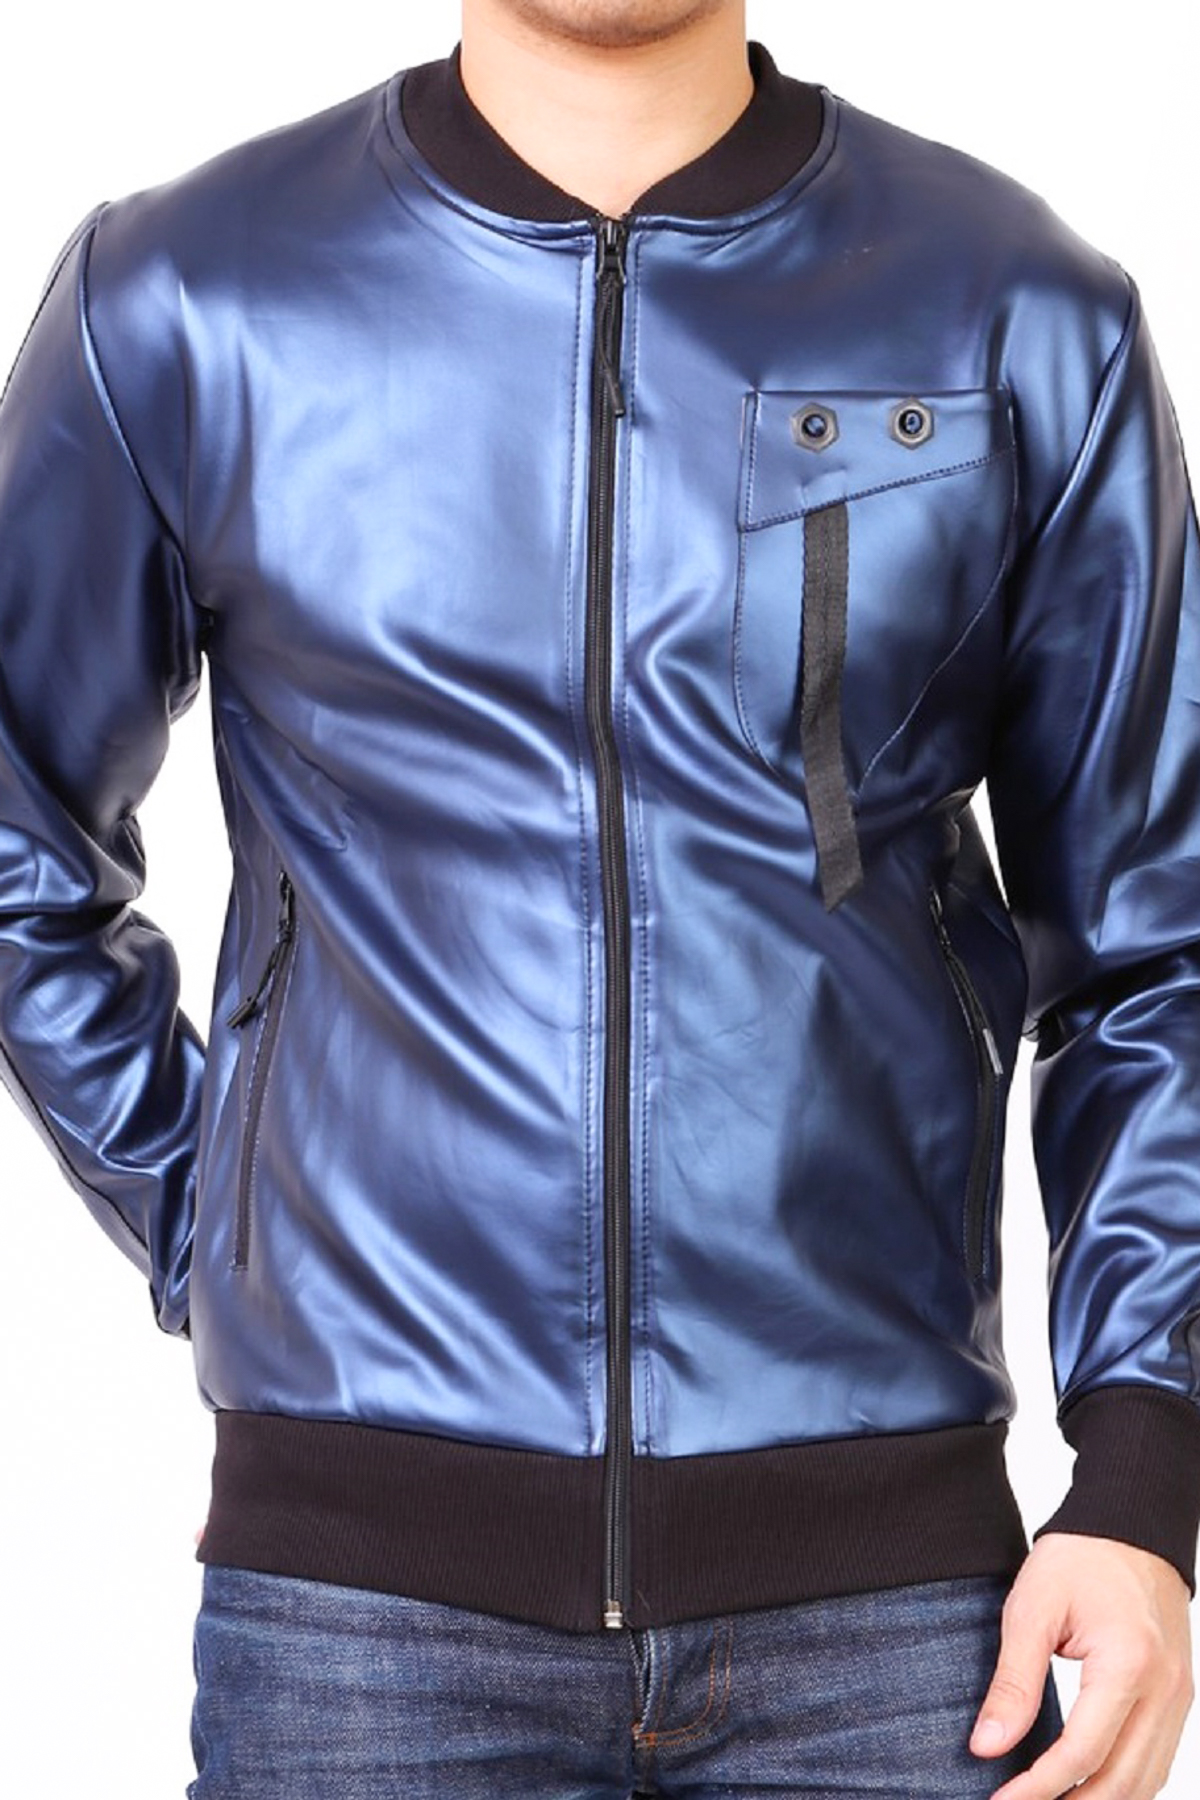 Vestes Homme Bleu marine KAYENNE VESTE ERG BM #c eFashion Paris